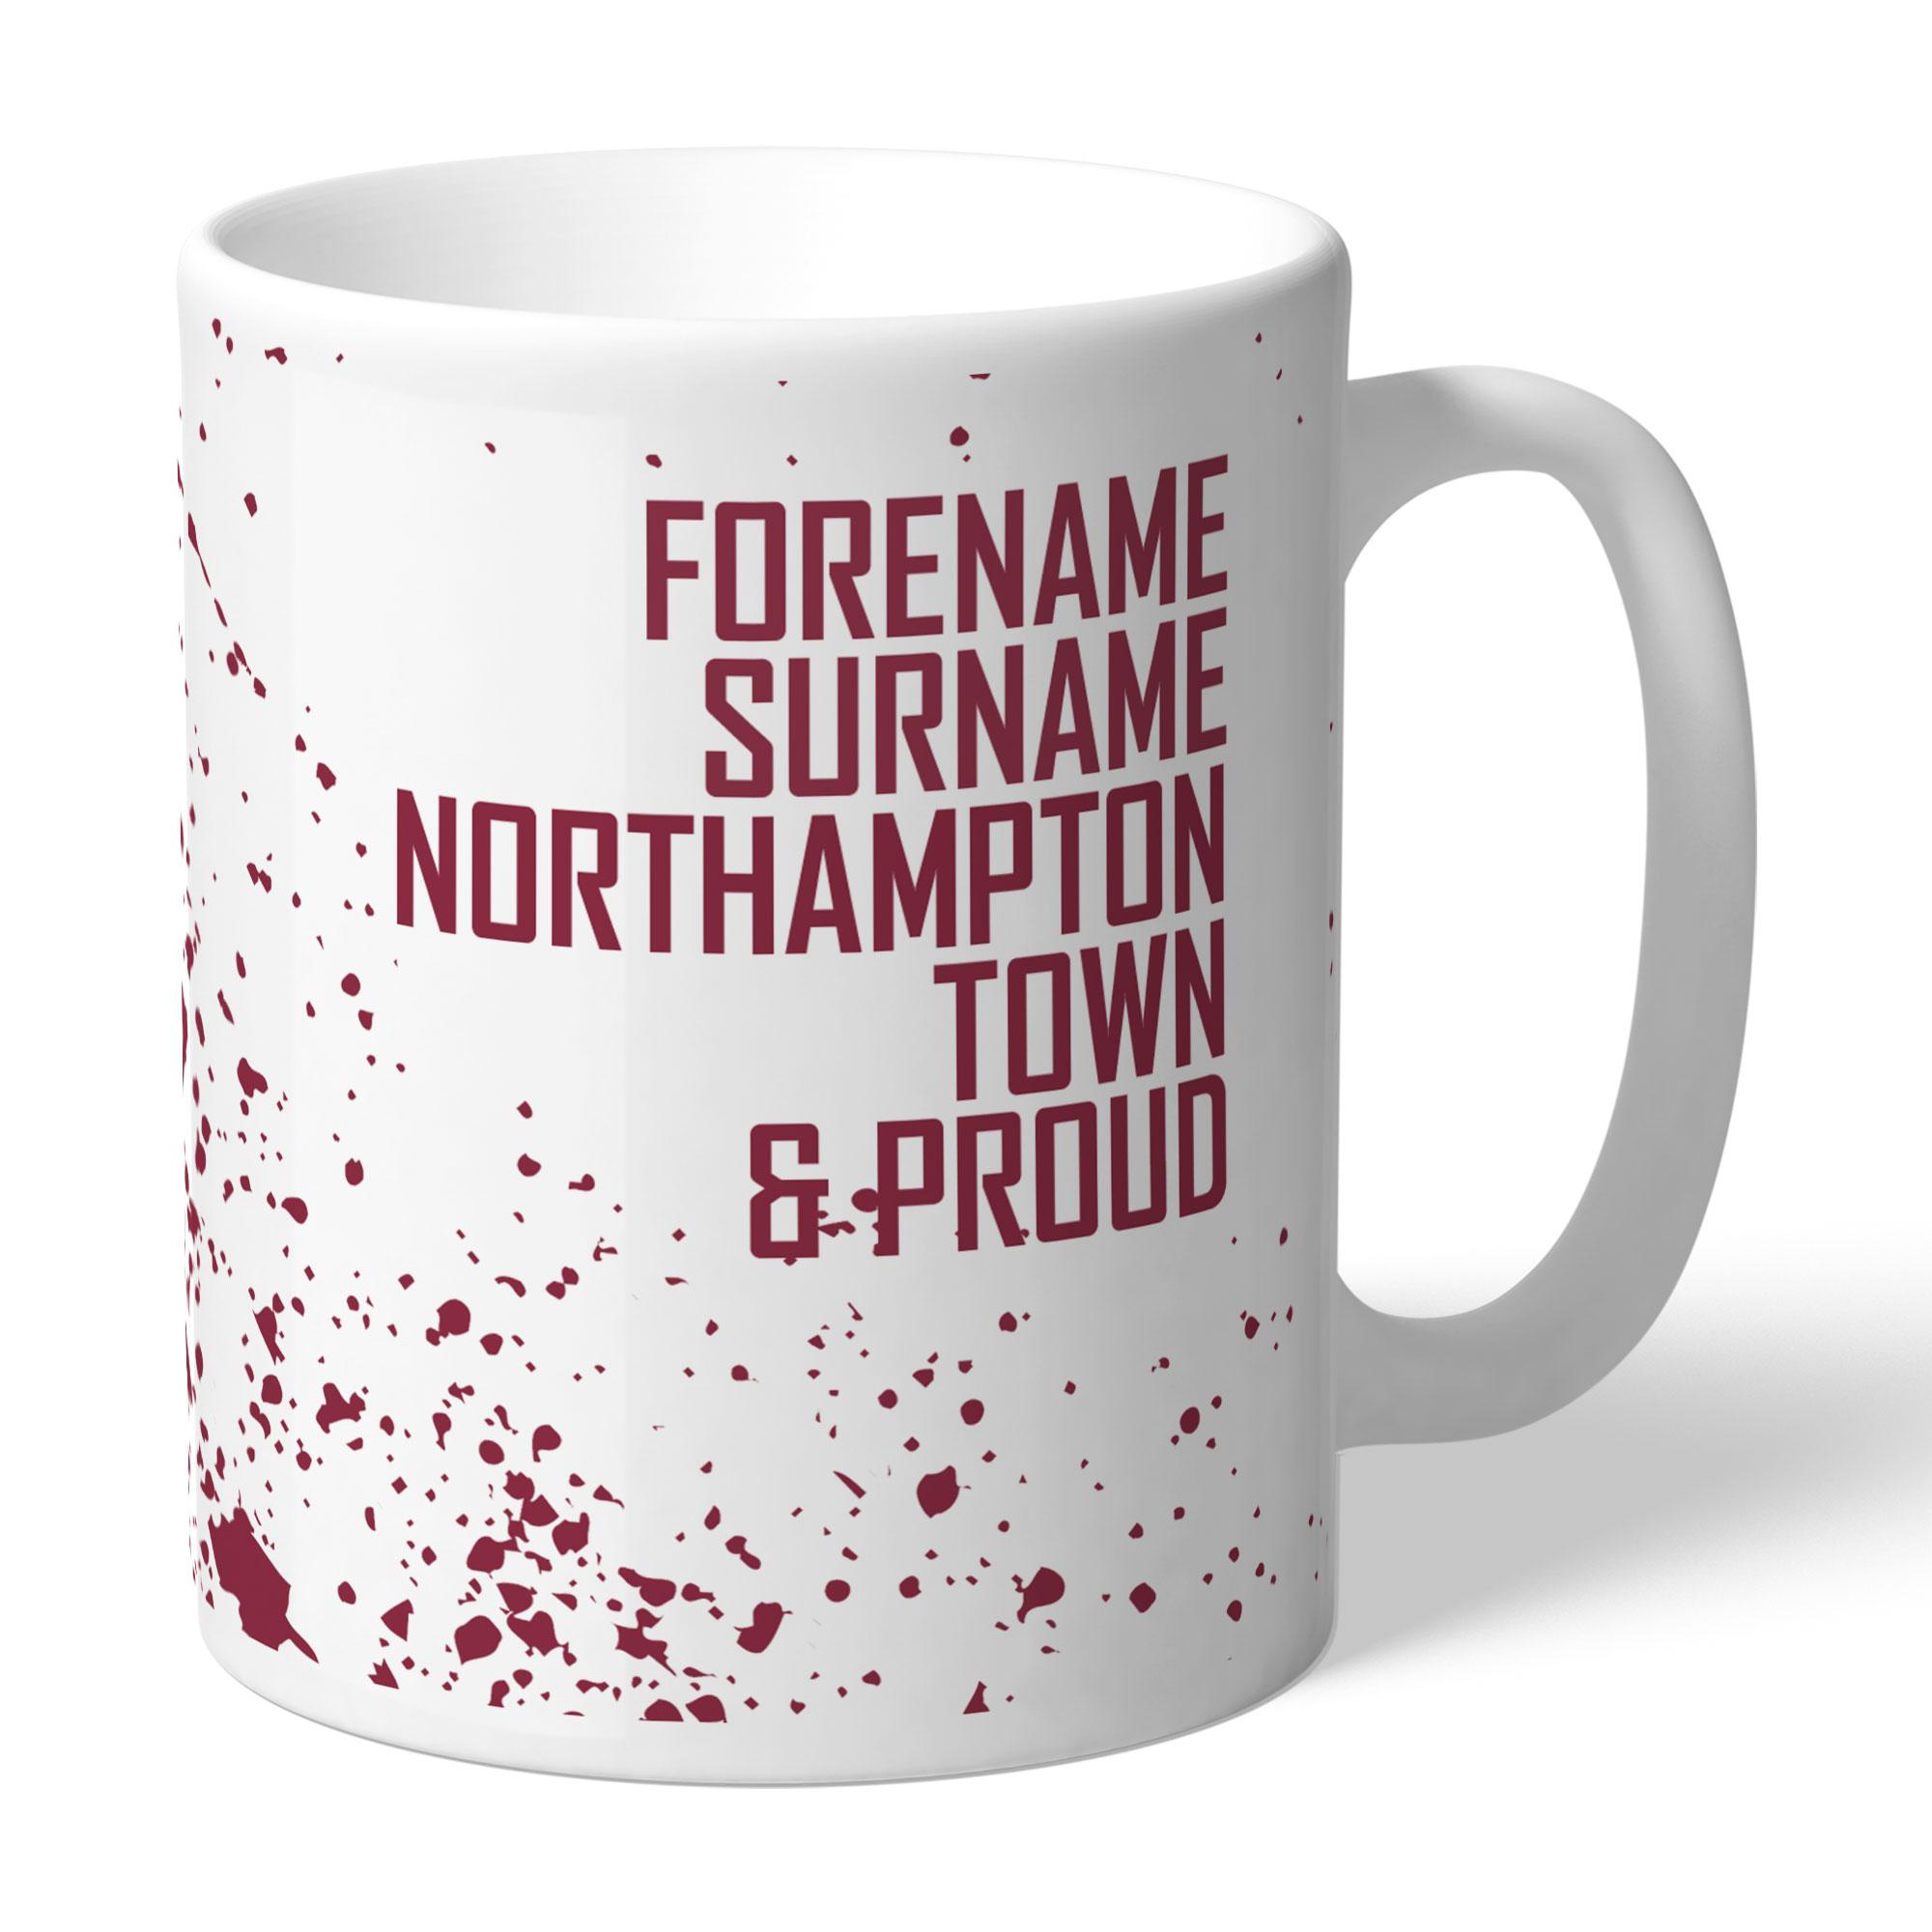 Northampton Town FC Proud Mug